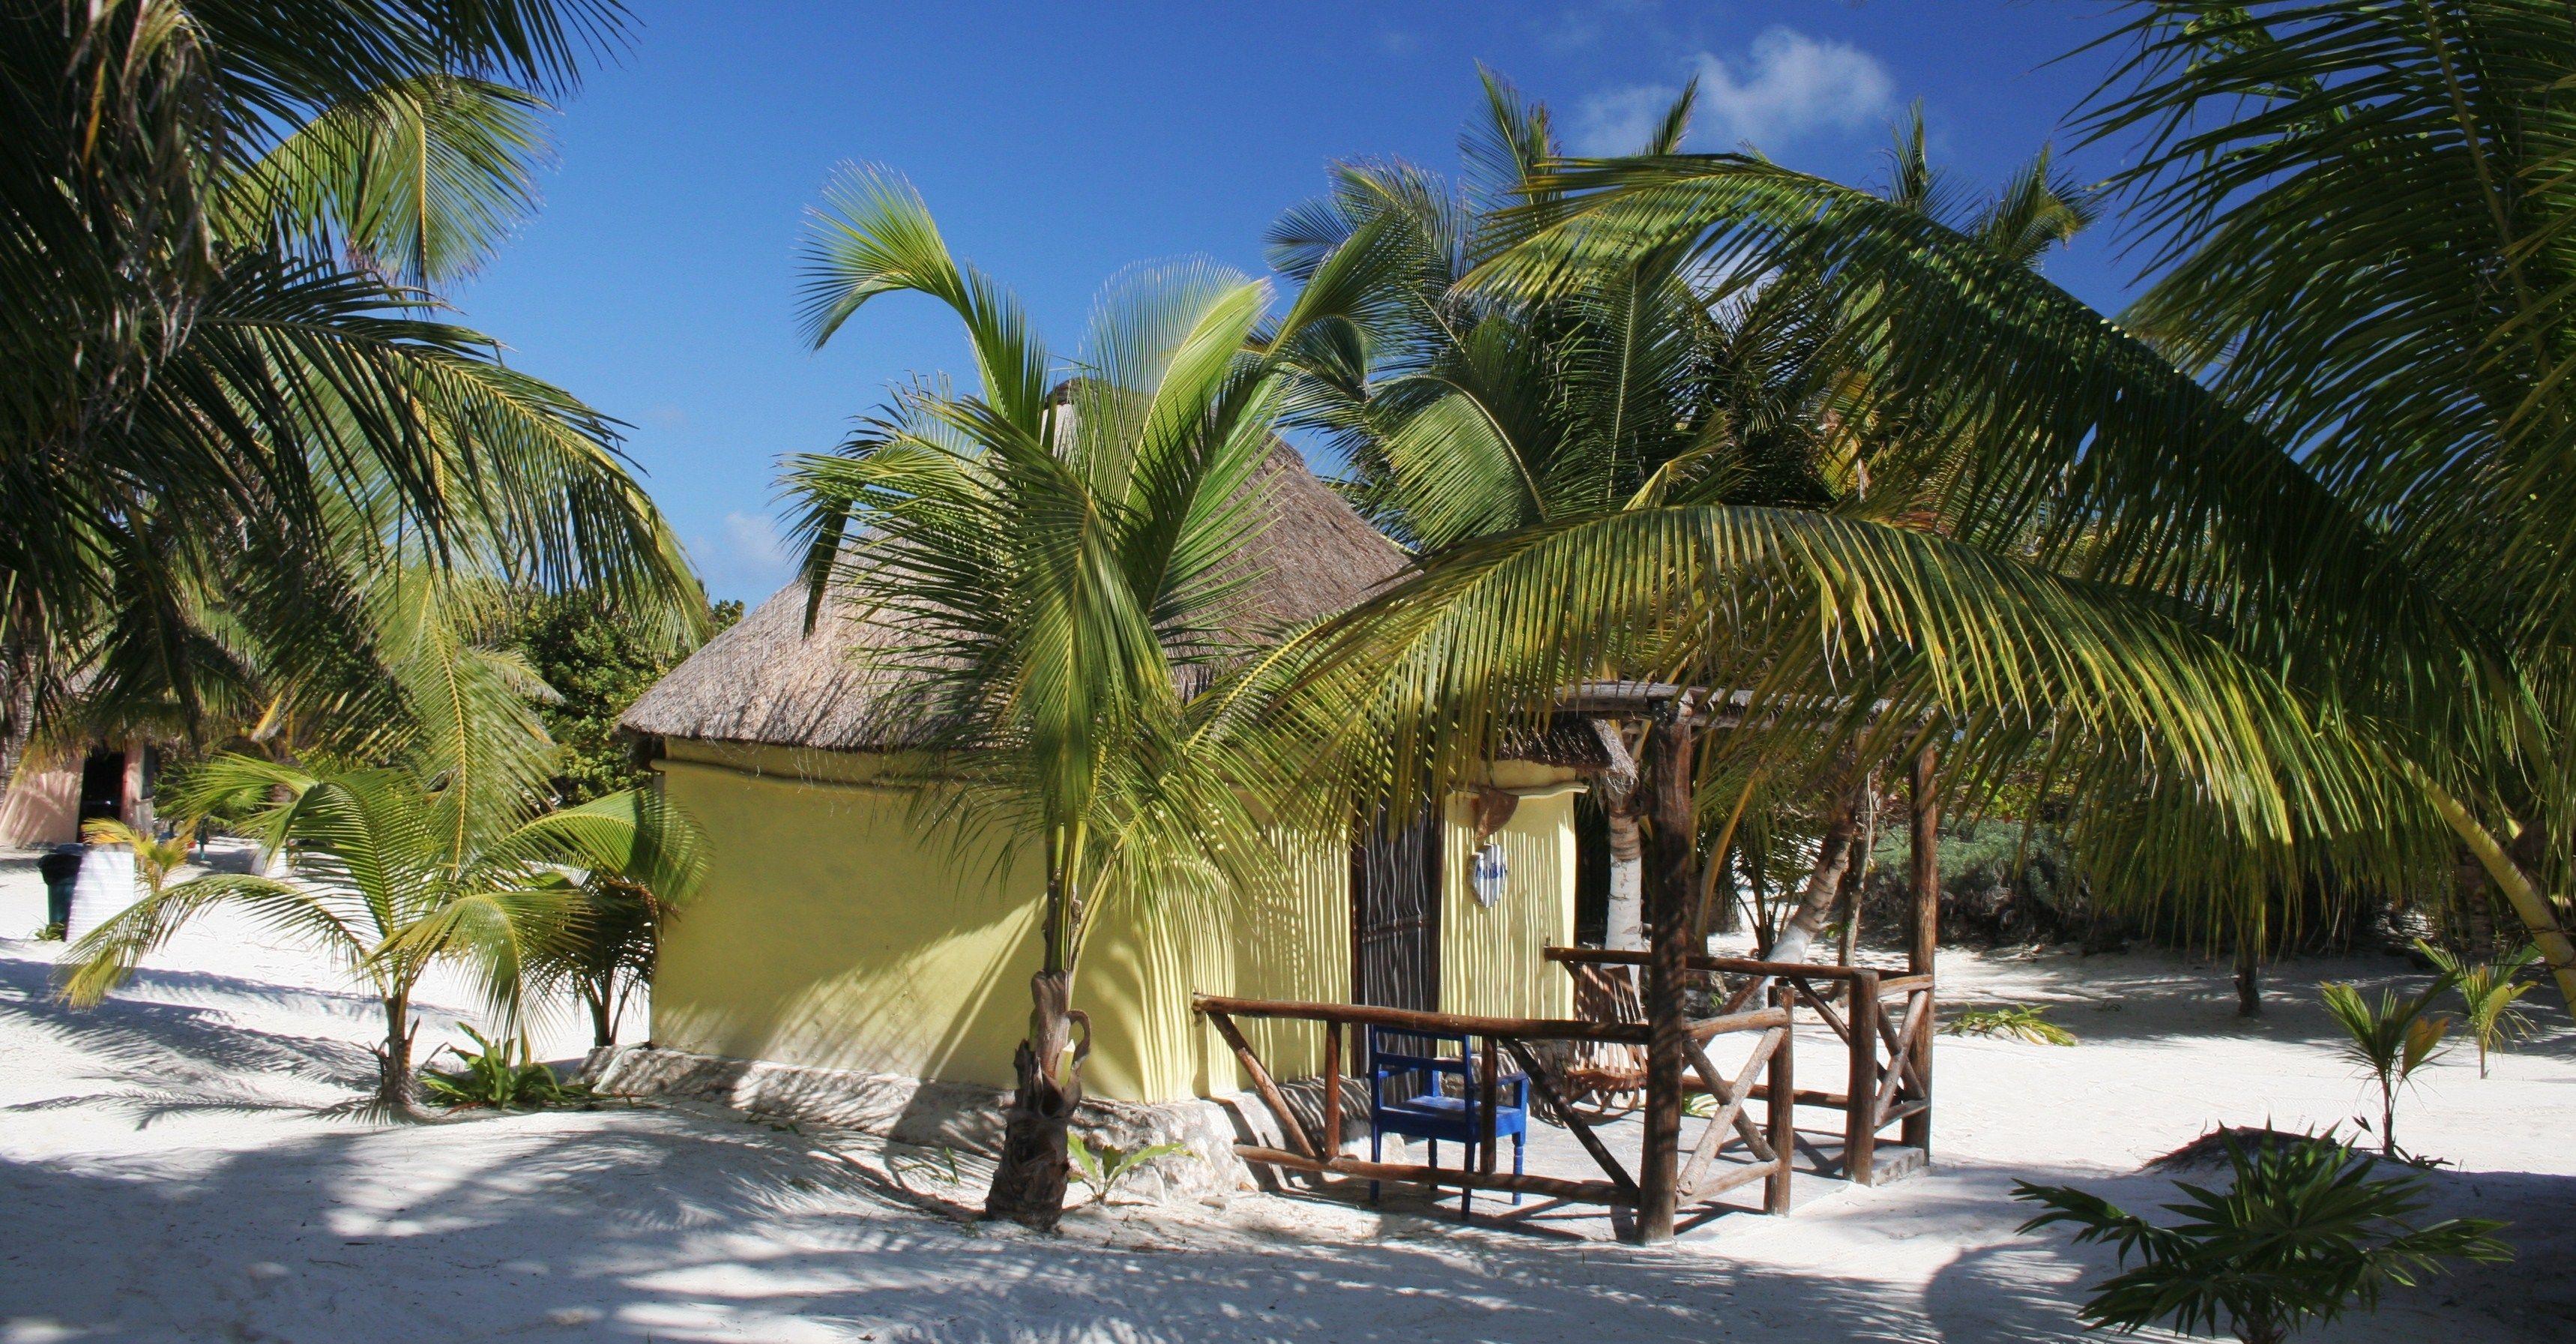 Mexico, Tulum. Zazil Kin, cabana Majahual.